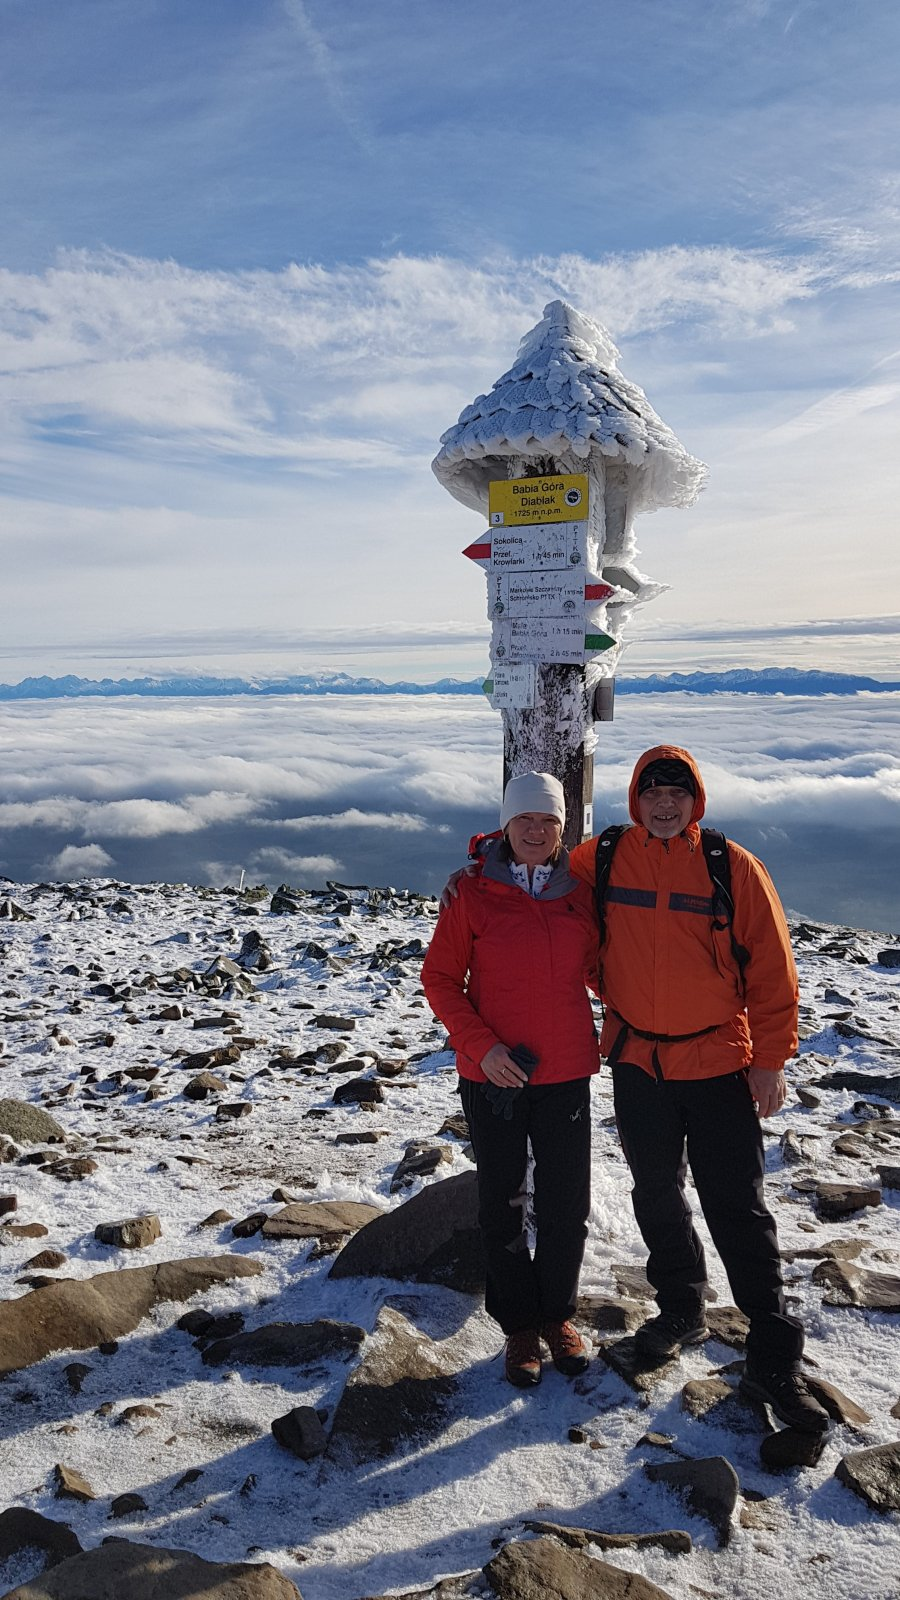 Fido a Myszka na vrcholu Babia Hora (25.11.2018 12:40)